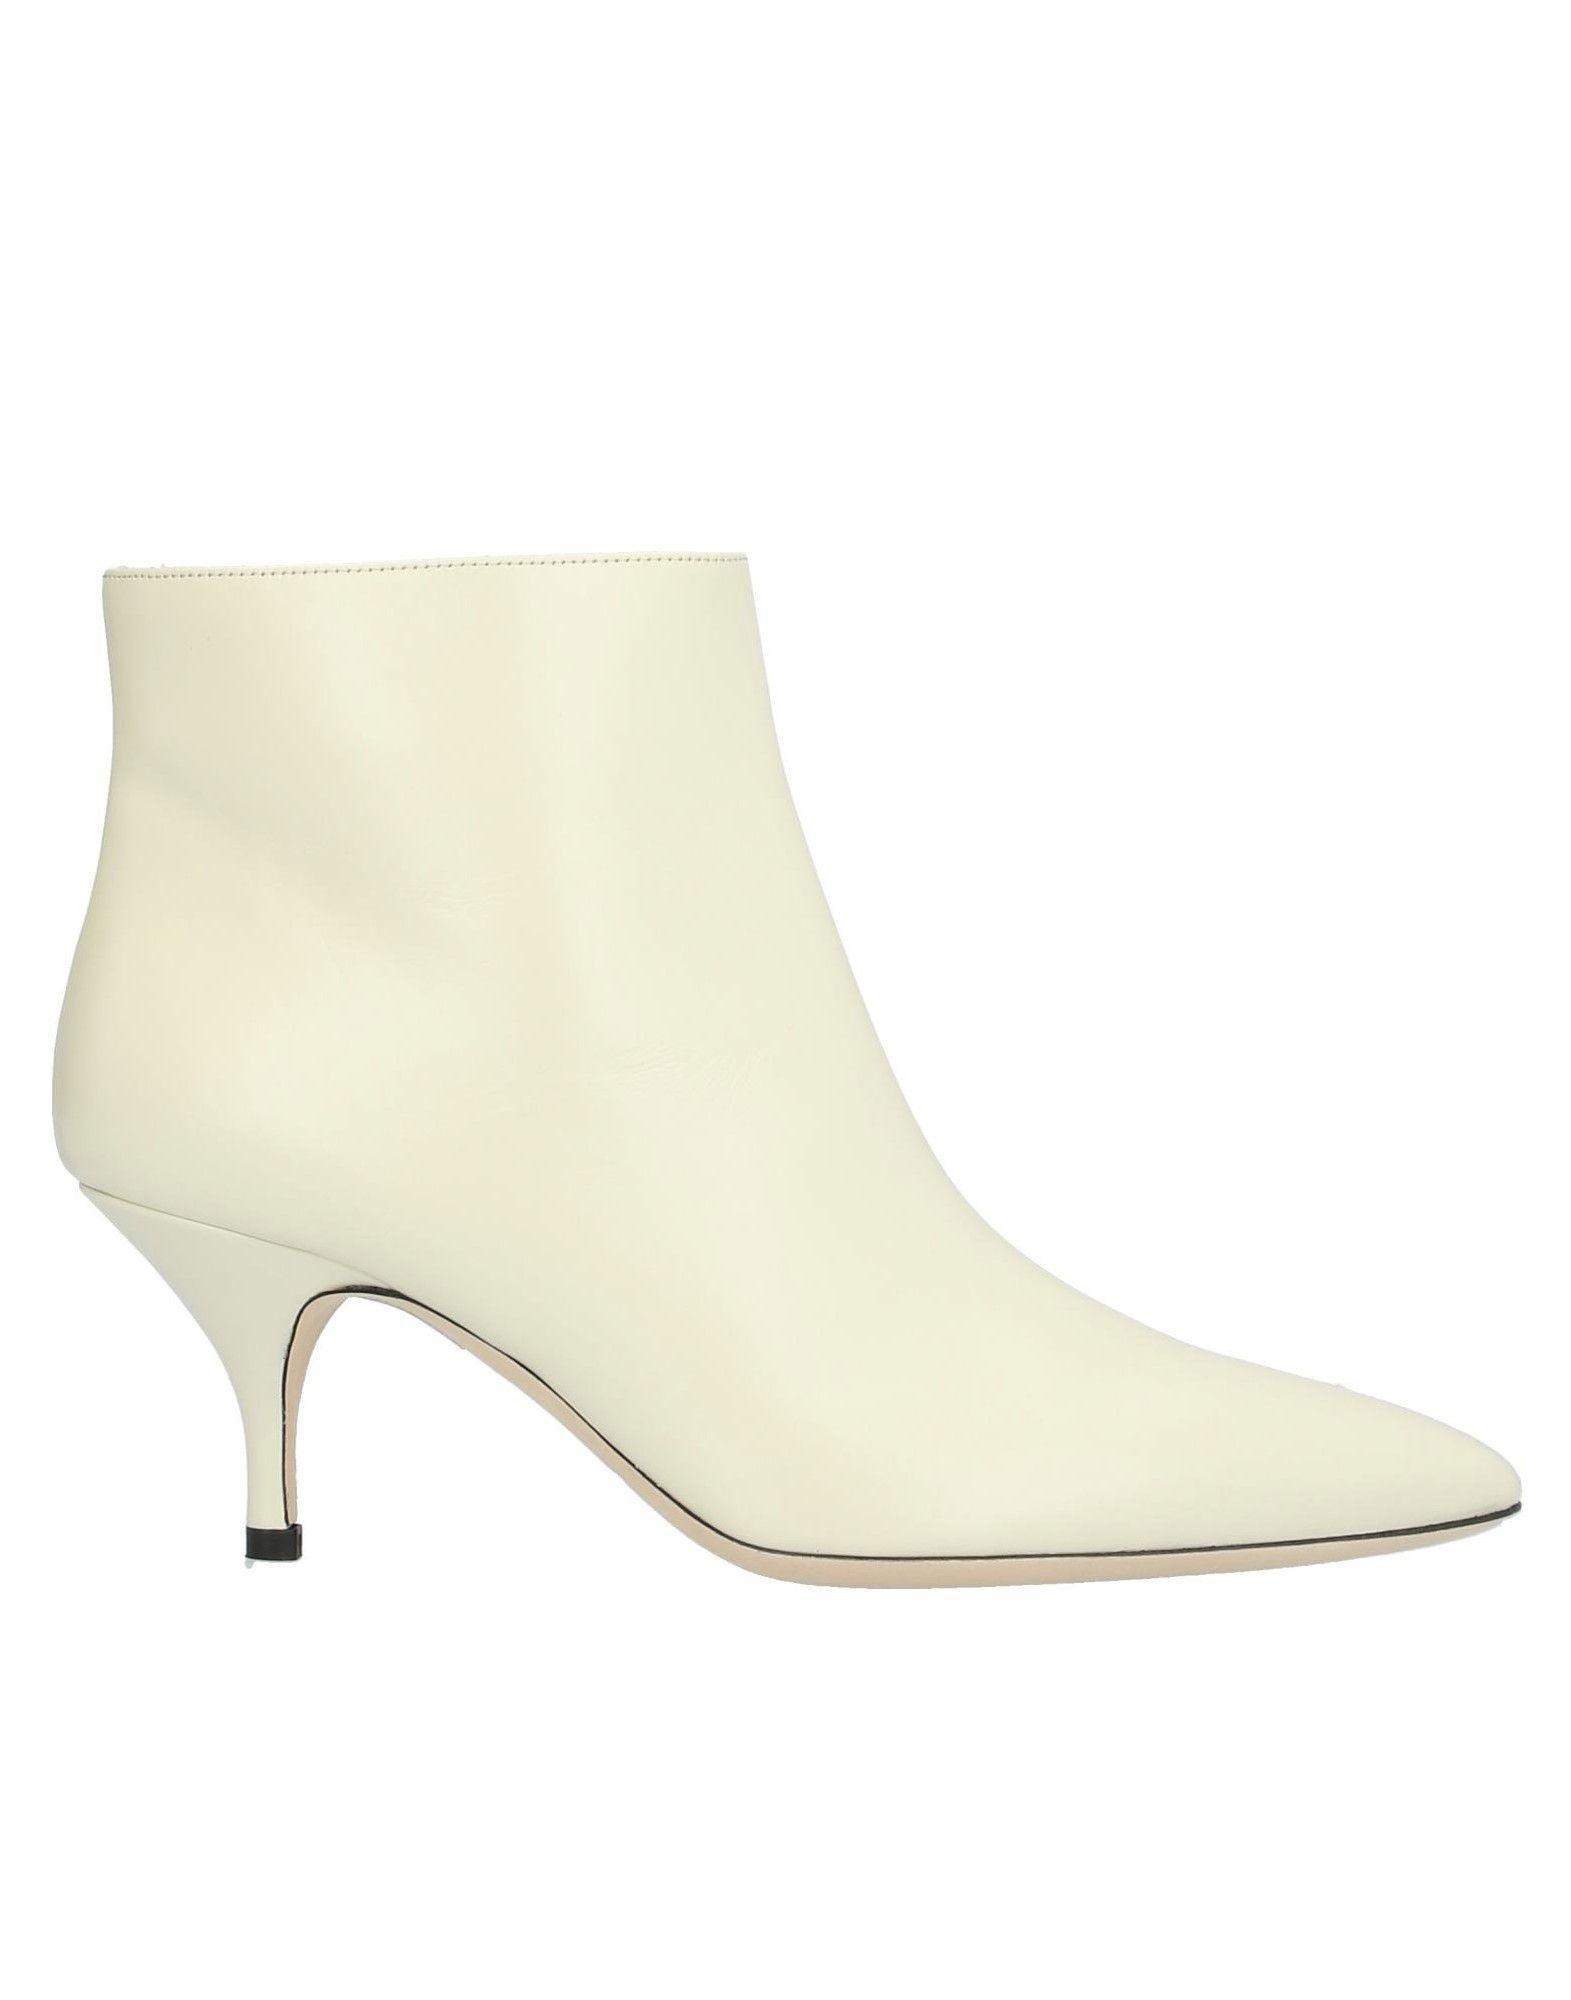 MAGDA BUTRYM Полусапоги и высокие ботинки magda butrym полусапоги и высокие ботинки